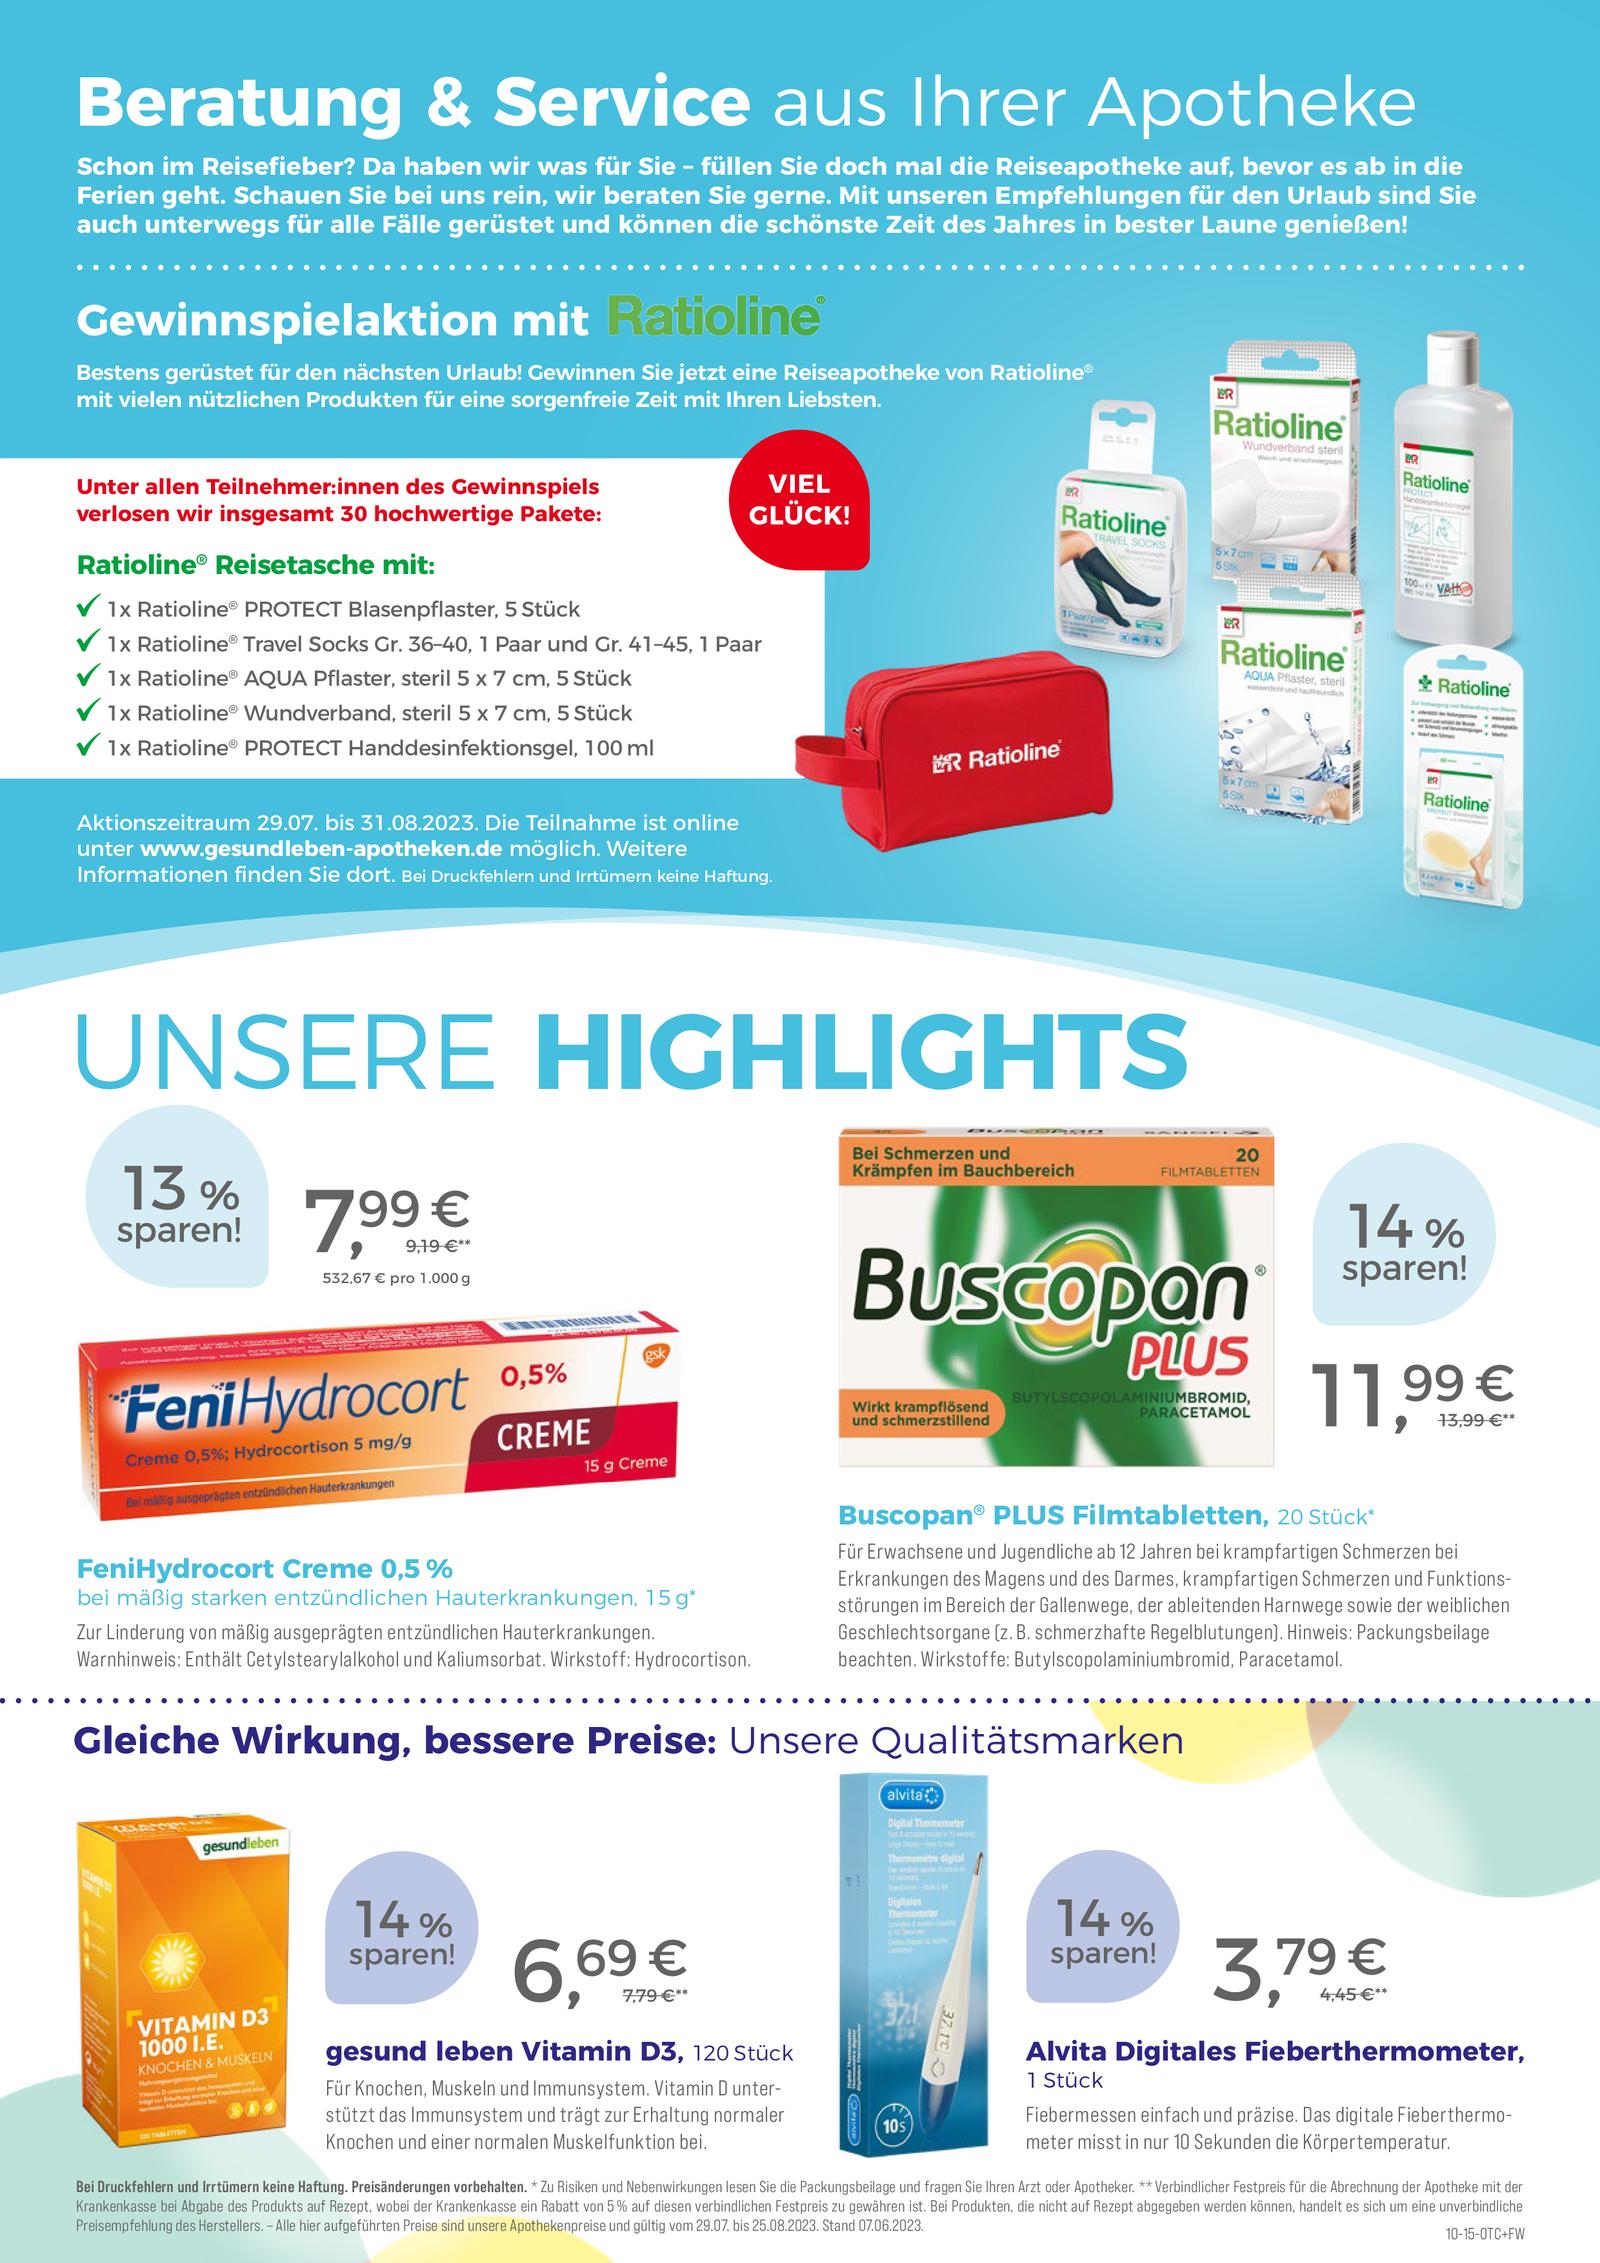 https://mein-uploads.apocdn.net/20016/leaflets/gesundleben_niedrig-Seite2.png